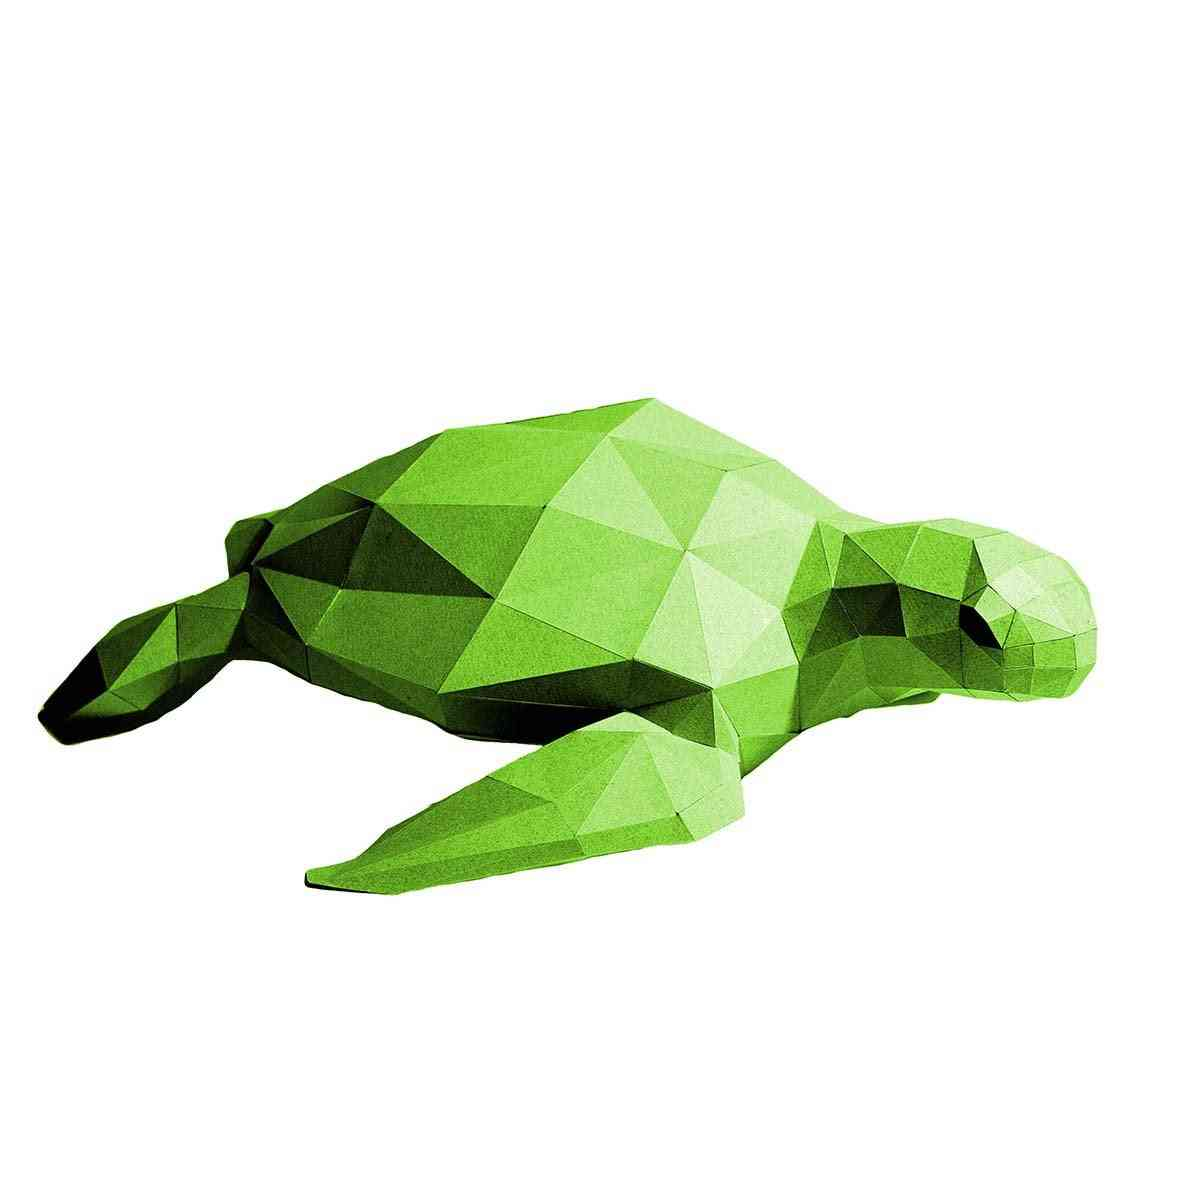 Sea Turtle 3d Paper Model